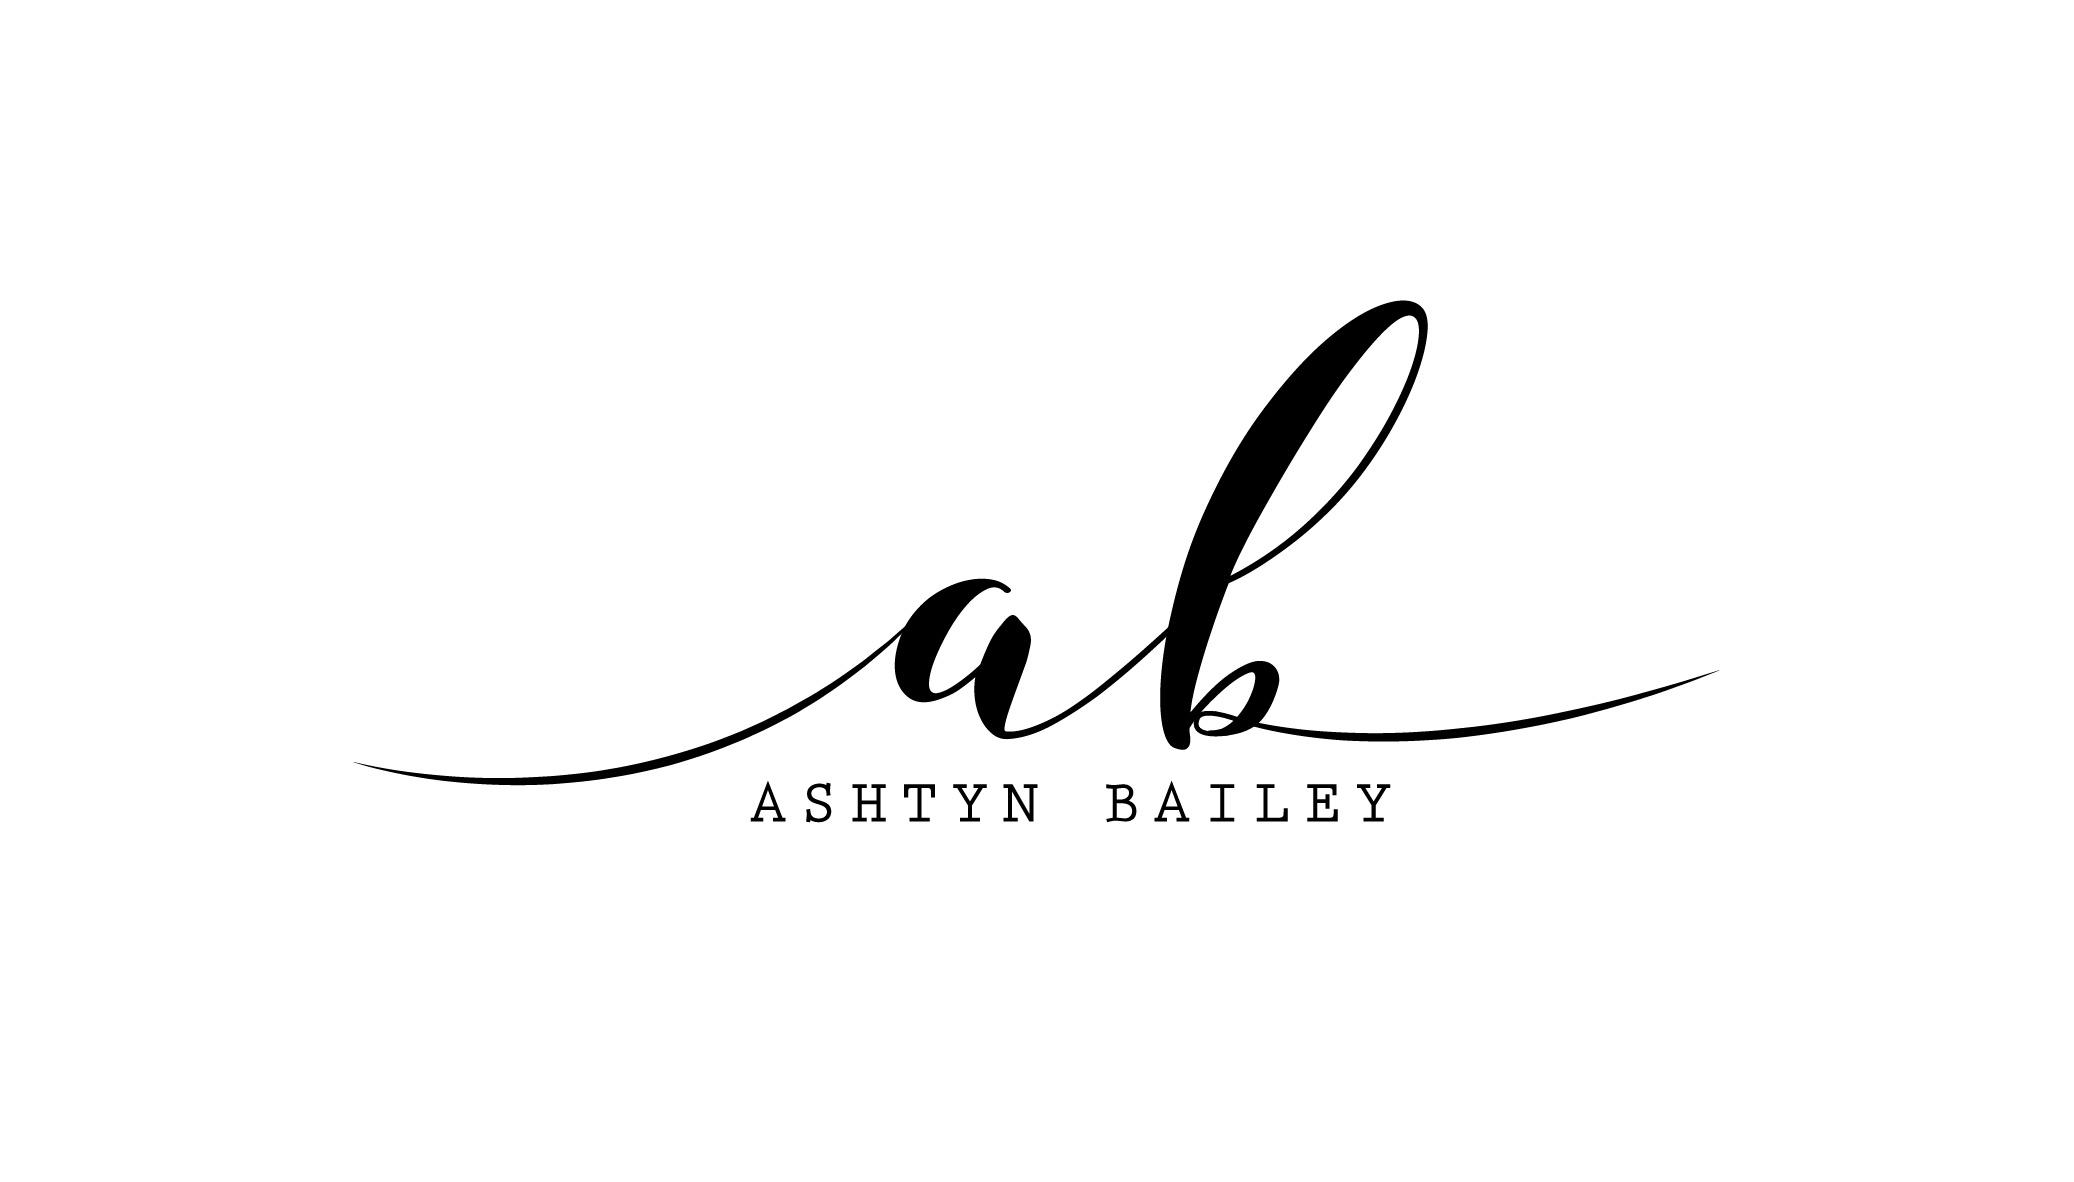 Ashtyn Bailey Hair